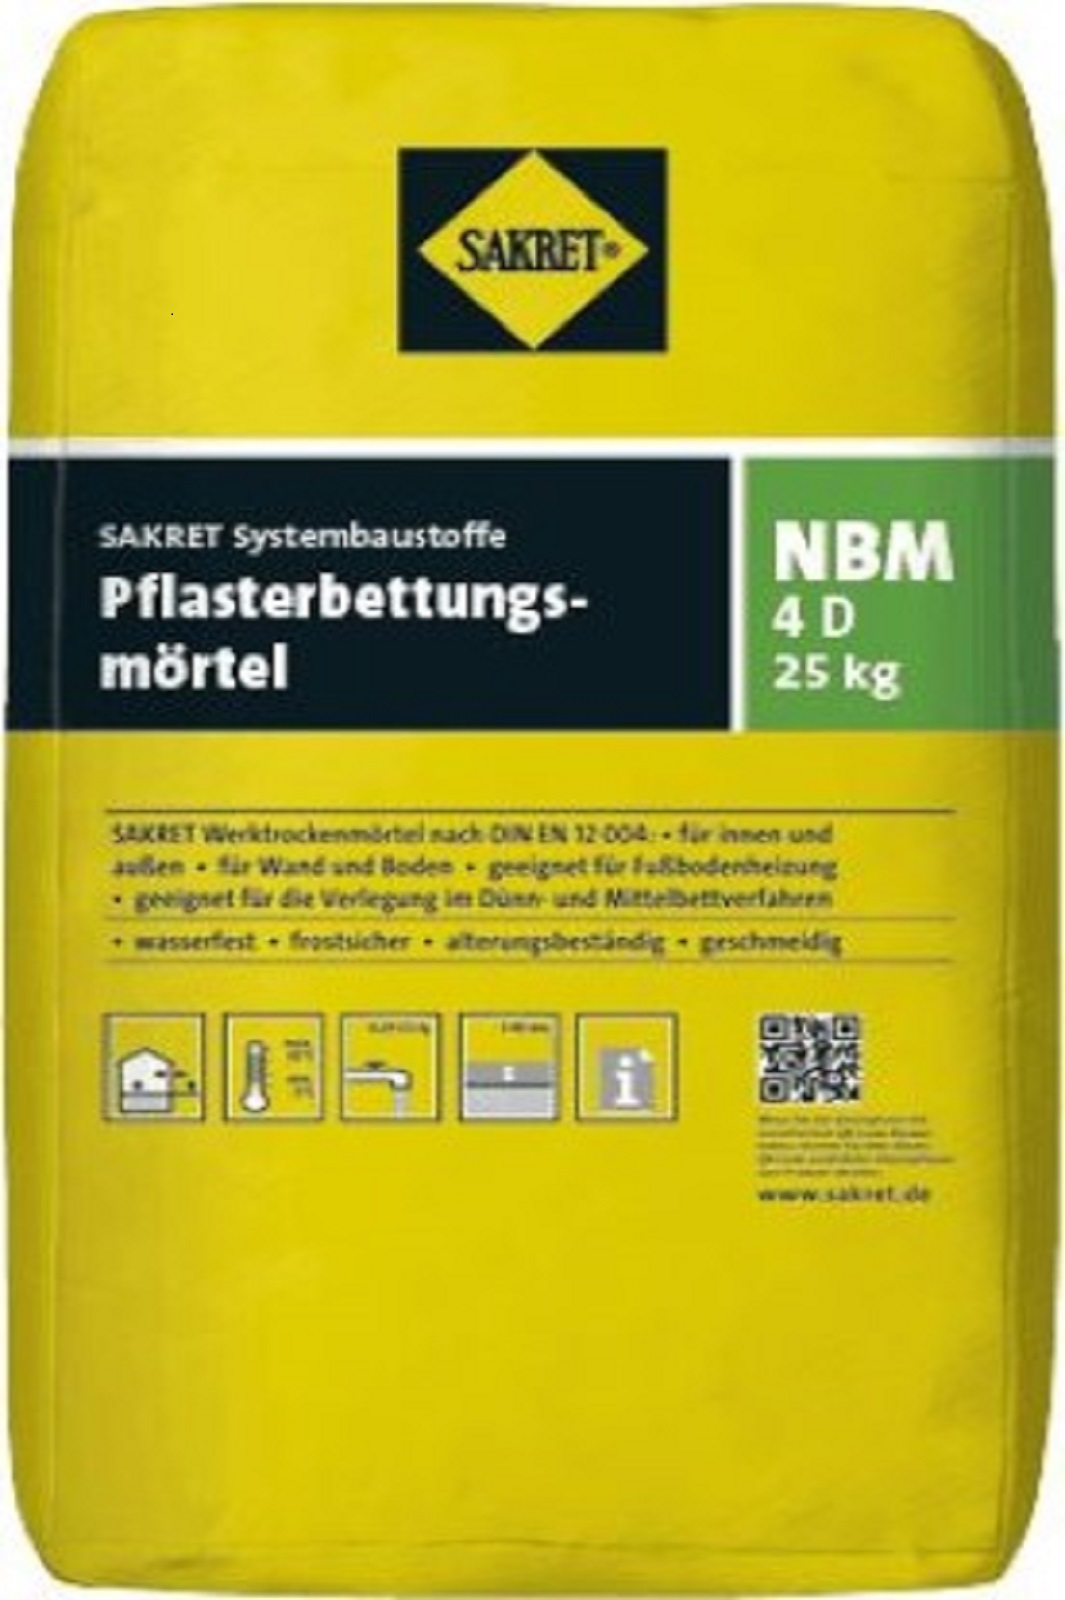 SAKRET Pflasterbettungsmörtel NBM 4 D 25kg